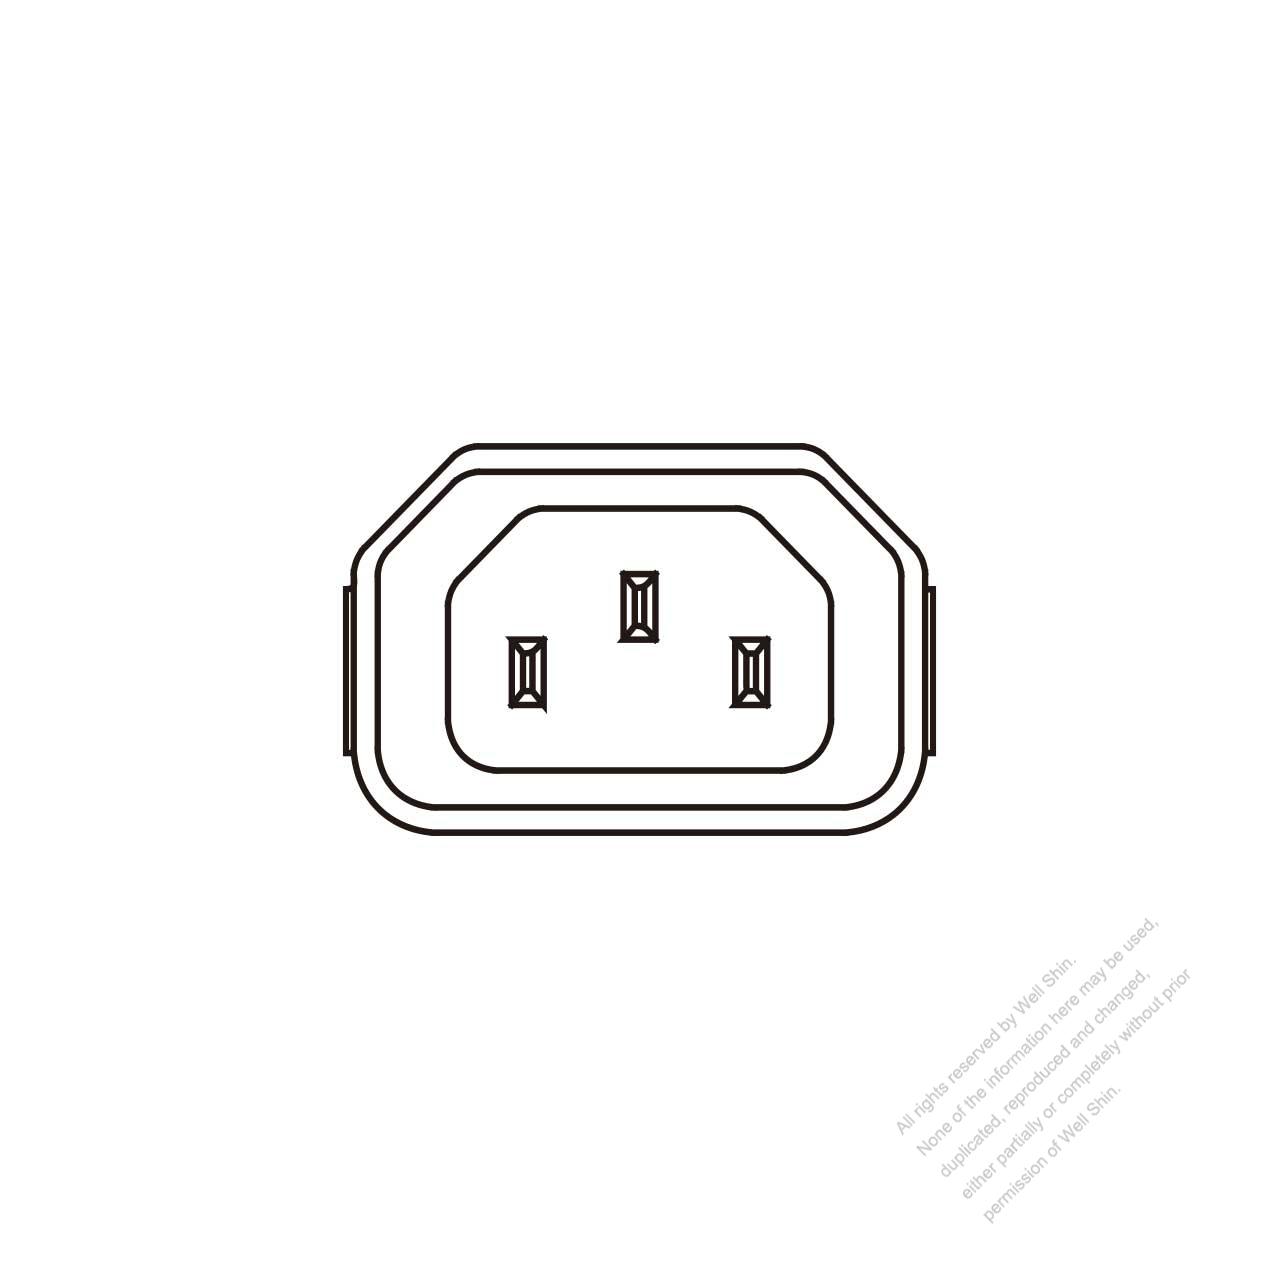 iec 60320-1  c14  appliance inlet 10a 250v